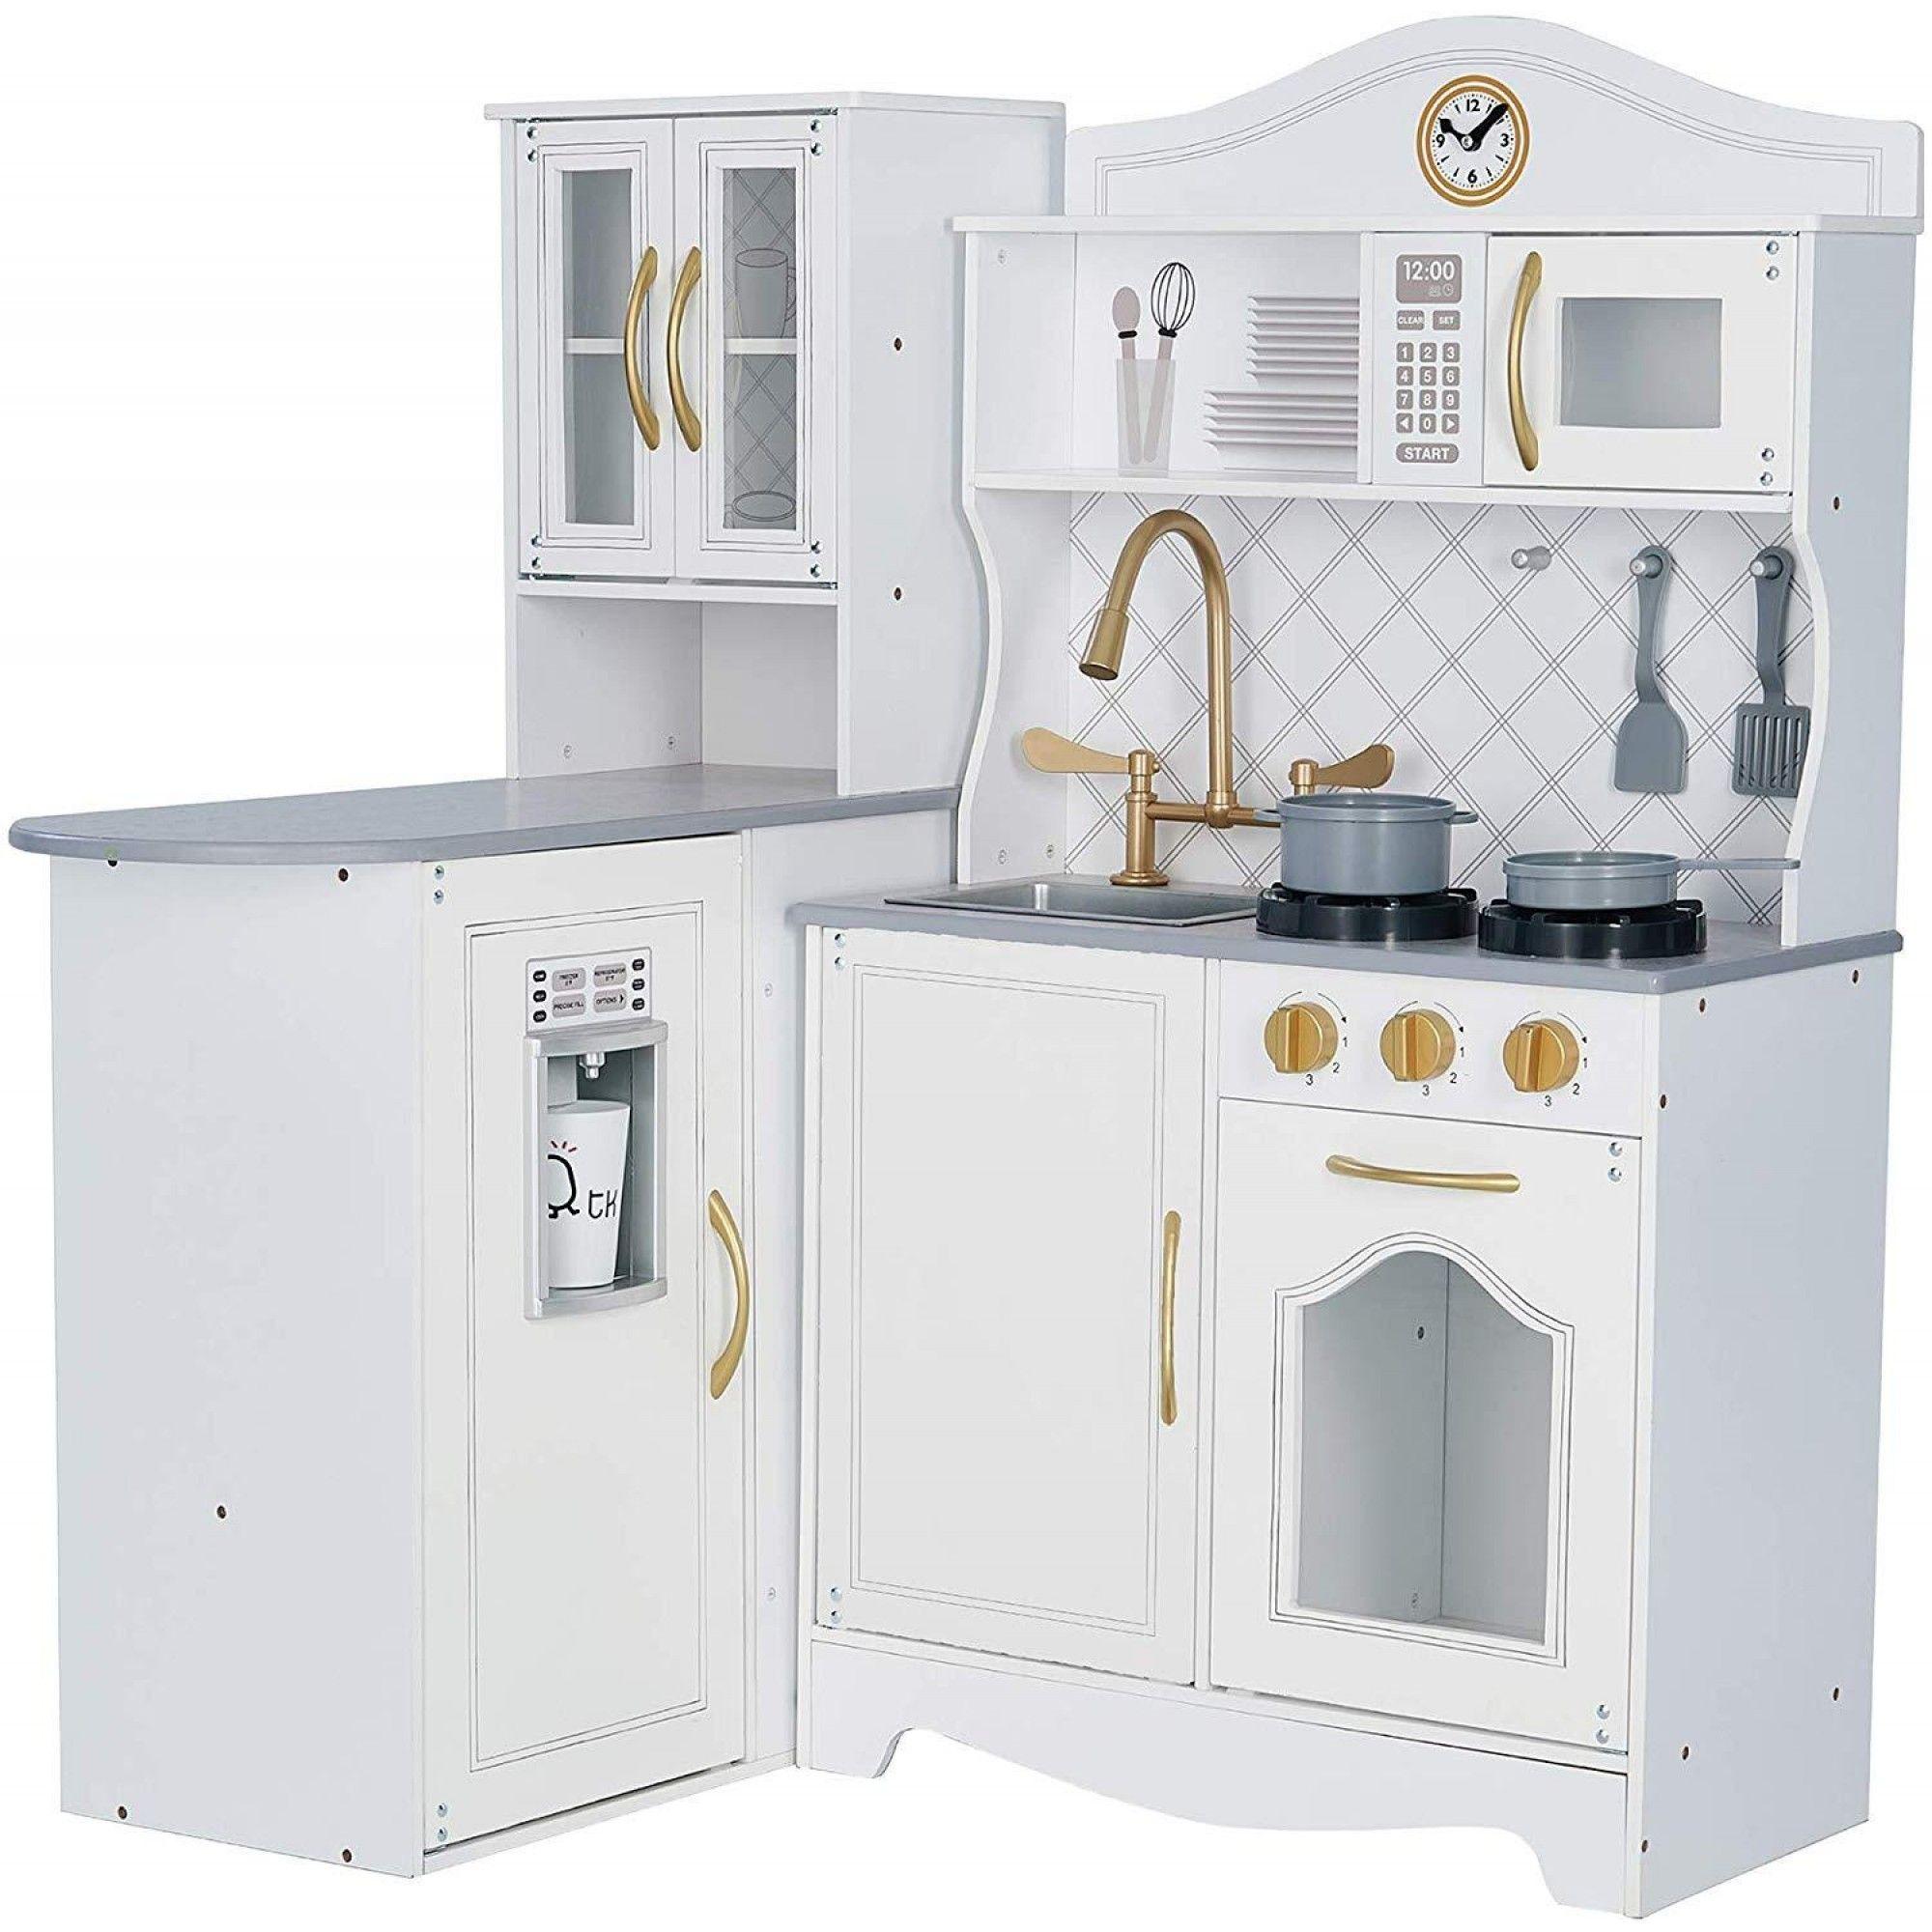 Teamson Kids Little Chef Marseille Retro Play Kitchen White In 2020 Play Kitchen White Kitchen Kitchen